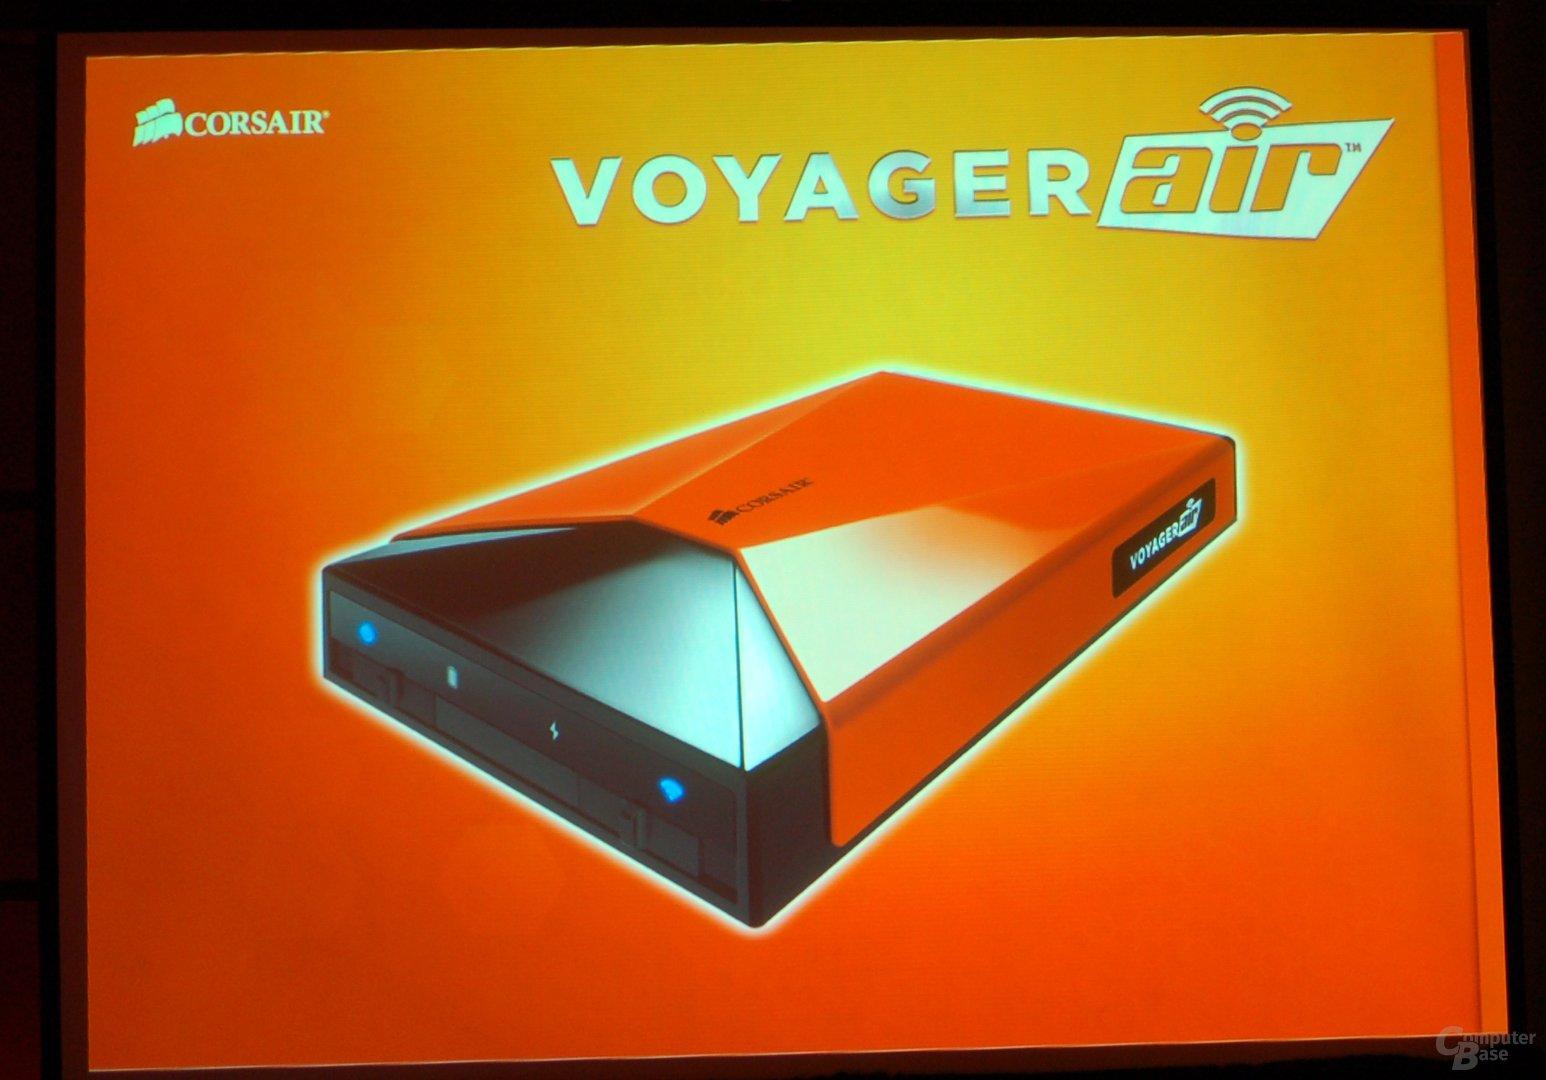 Corsair Voyager Air